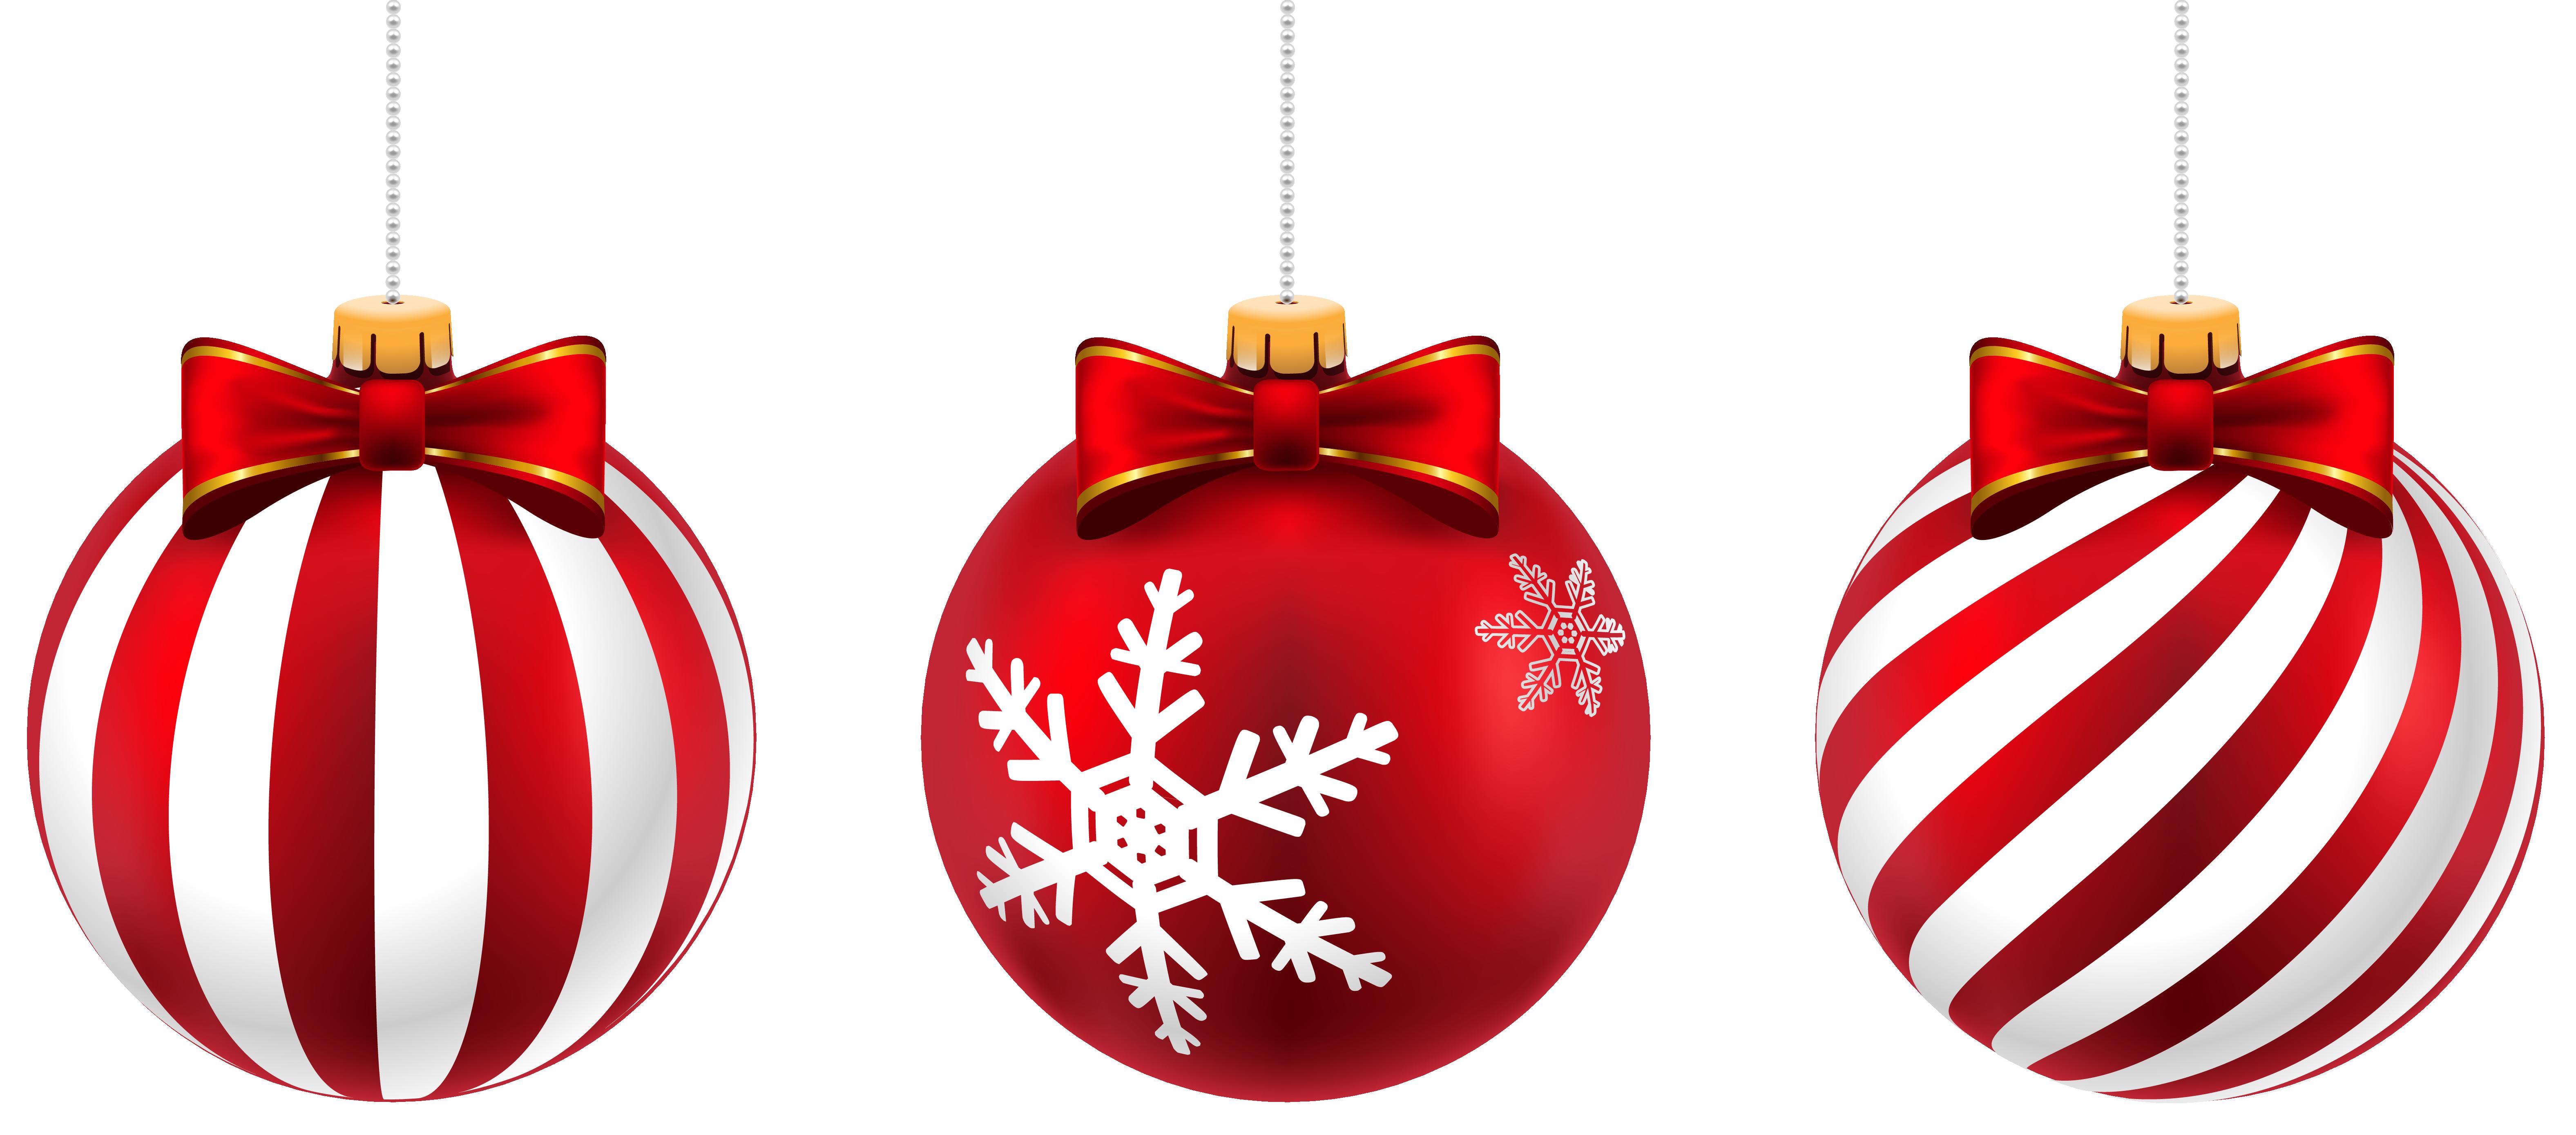 Beautiful Christmas Balls Png Clip Art Image